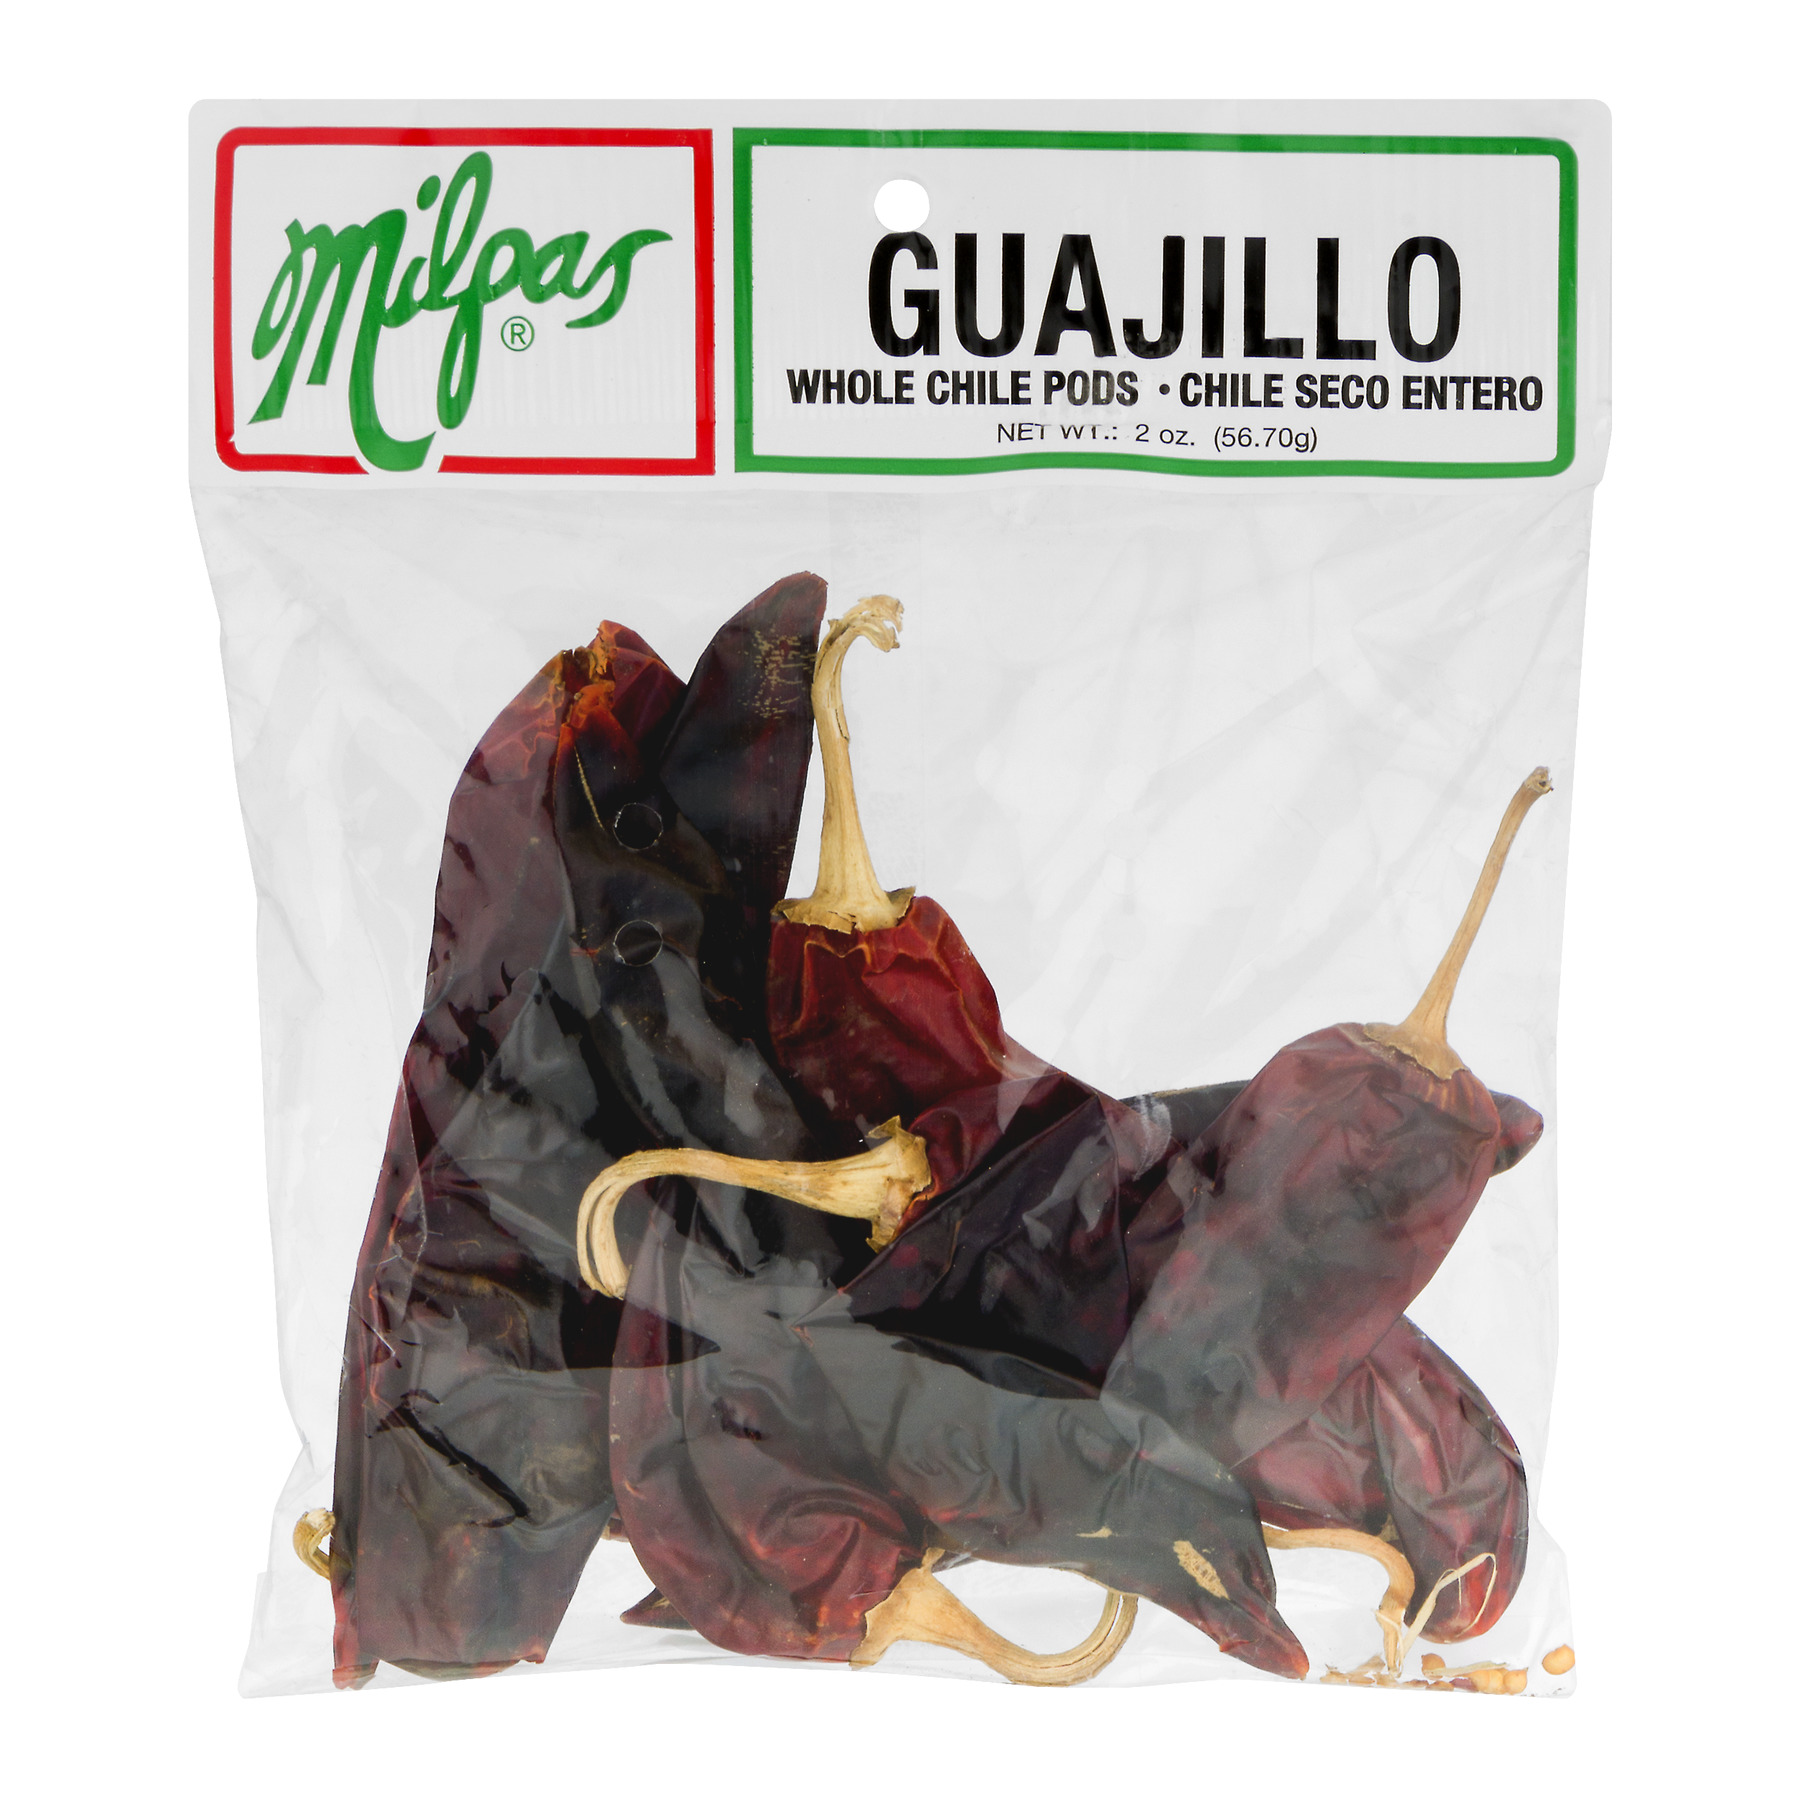 (3 Pack) Milpas Guajillo Whole Chile Pods, 2.0 OZ